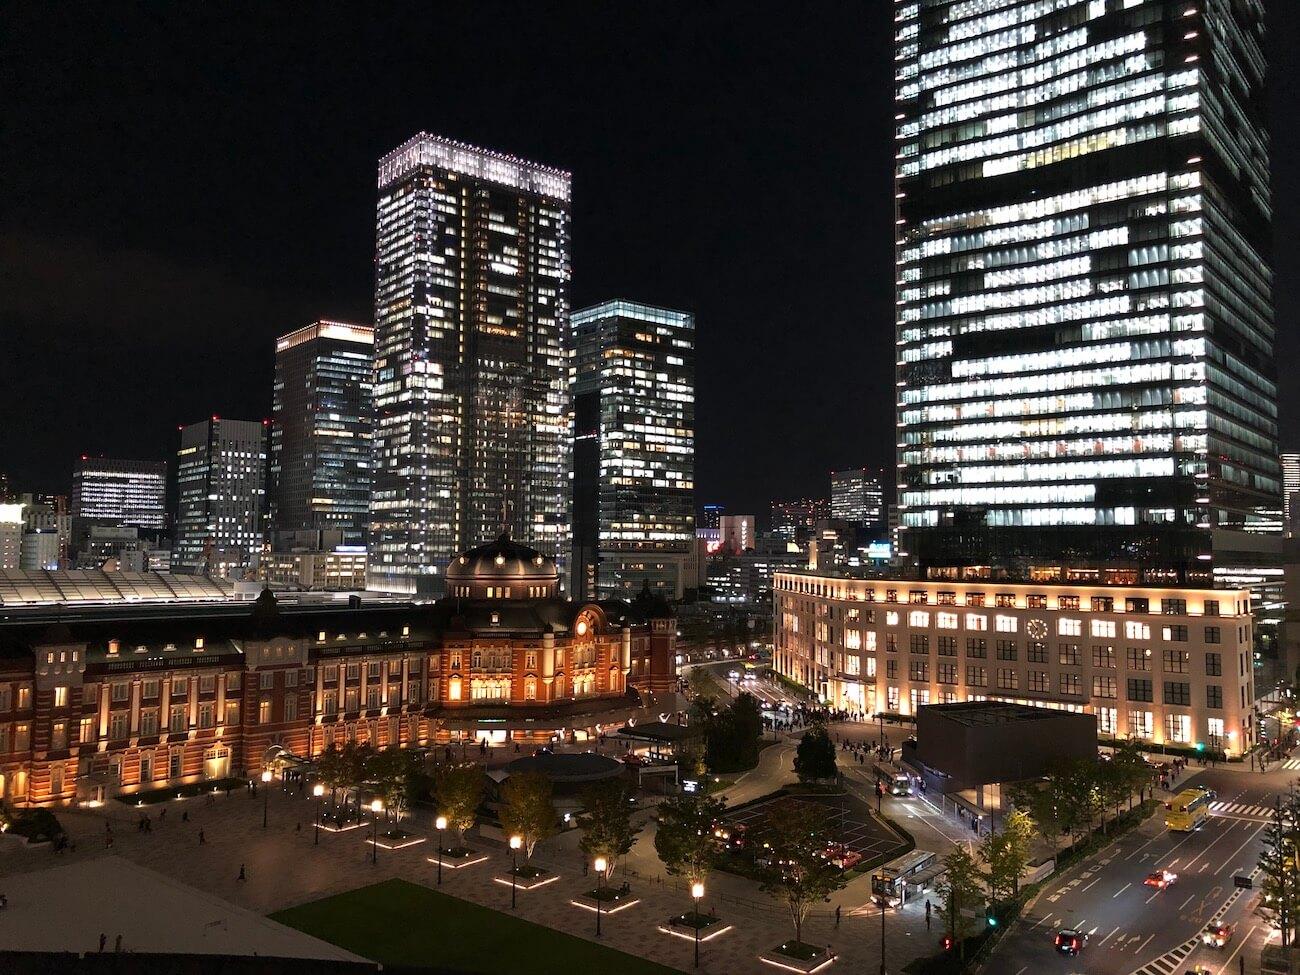 Xperia 5 夜景撮影